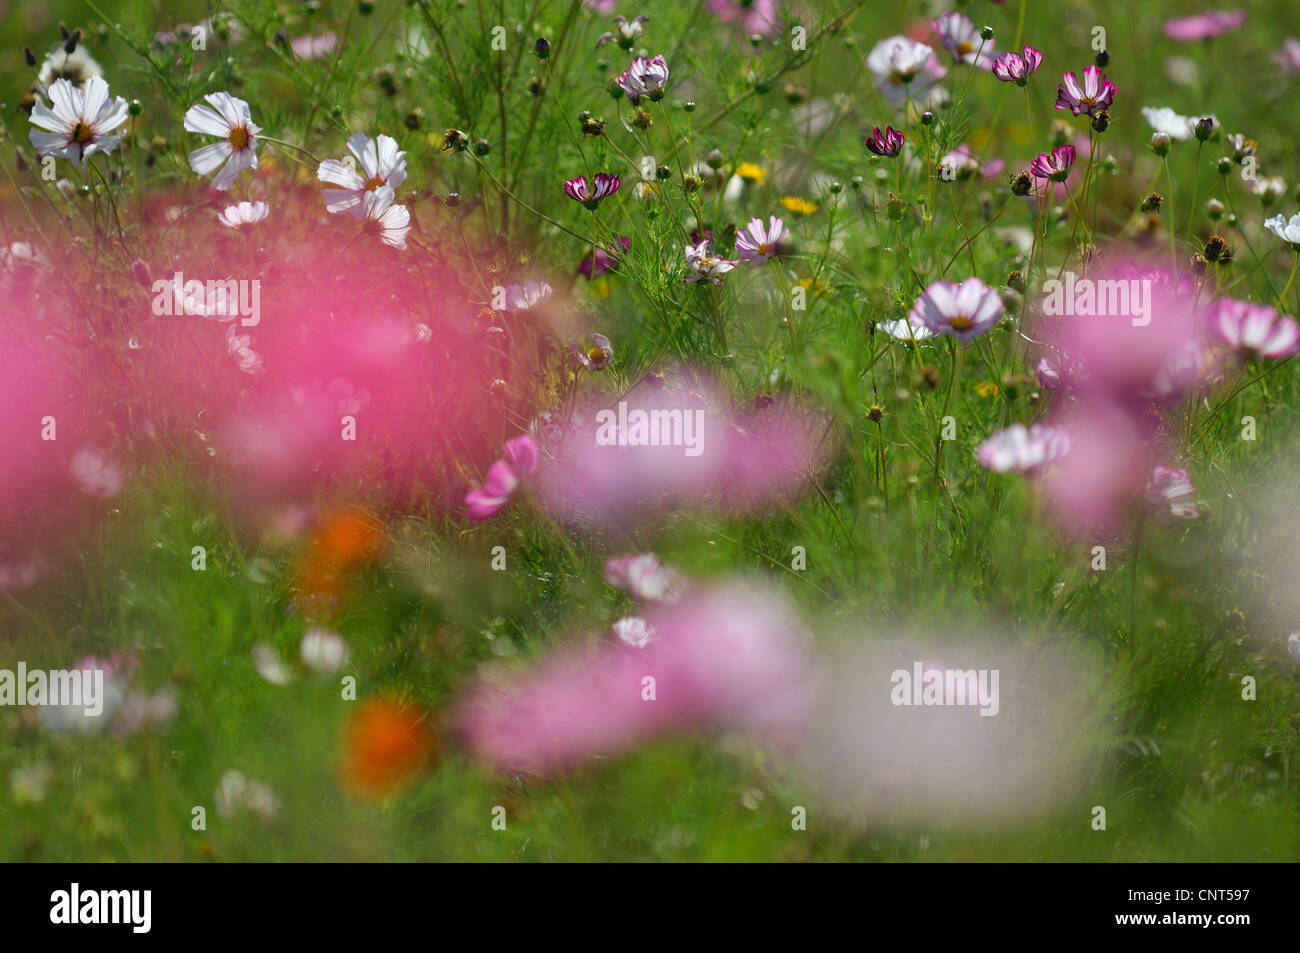 garden cosmos, Mexican aster (Cosmos bipinnatus), flower meadow with cosmos - Stock Image